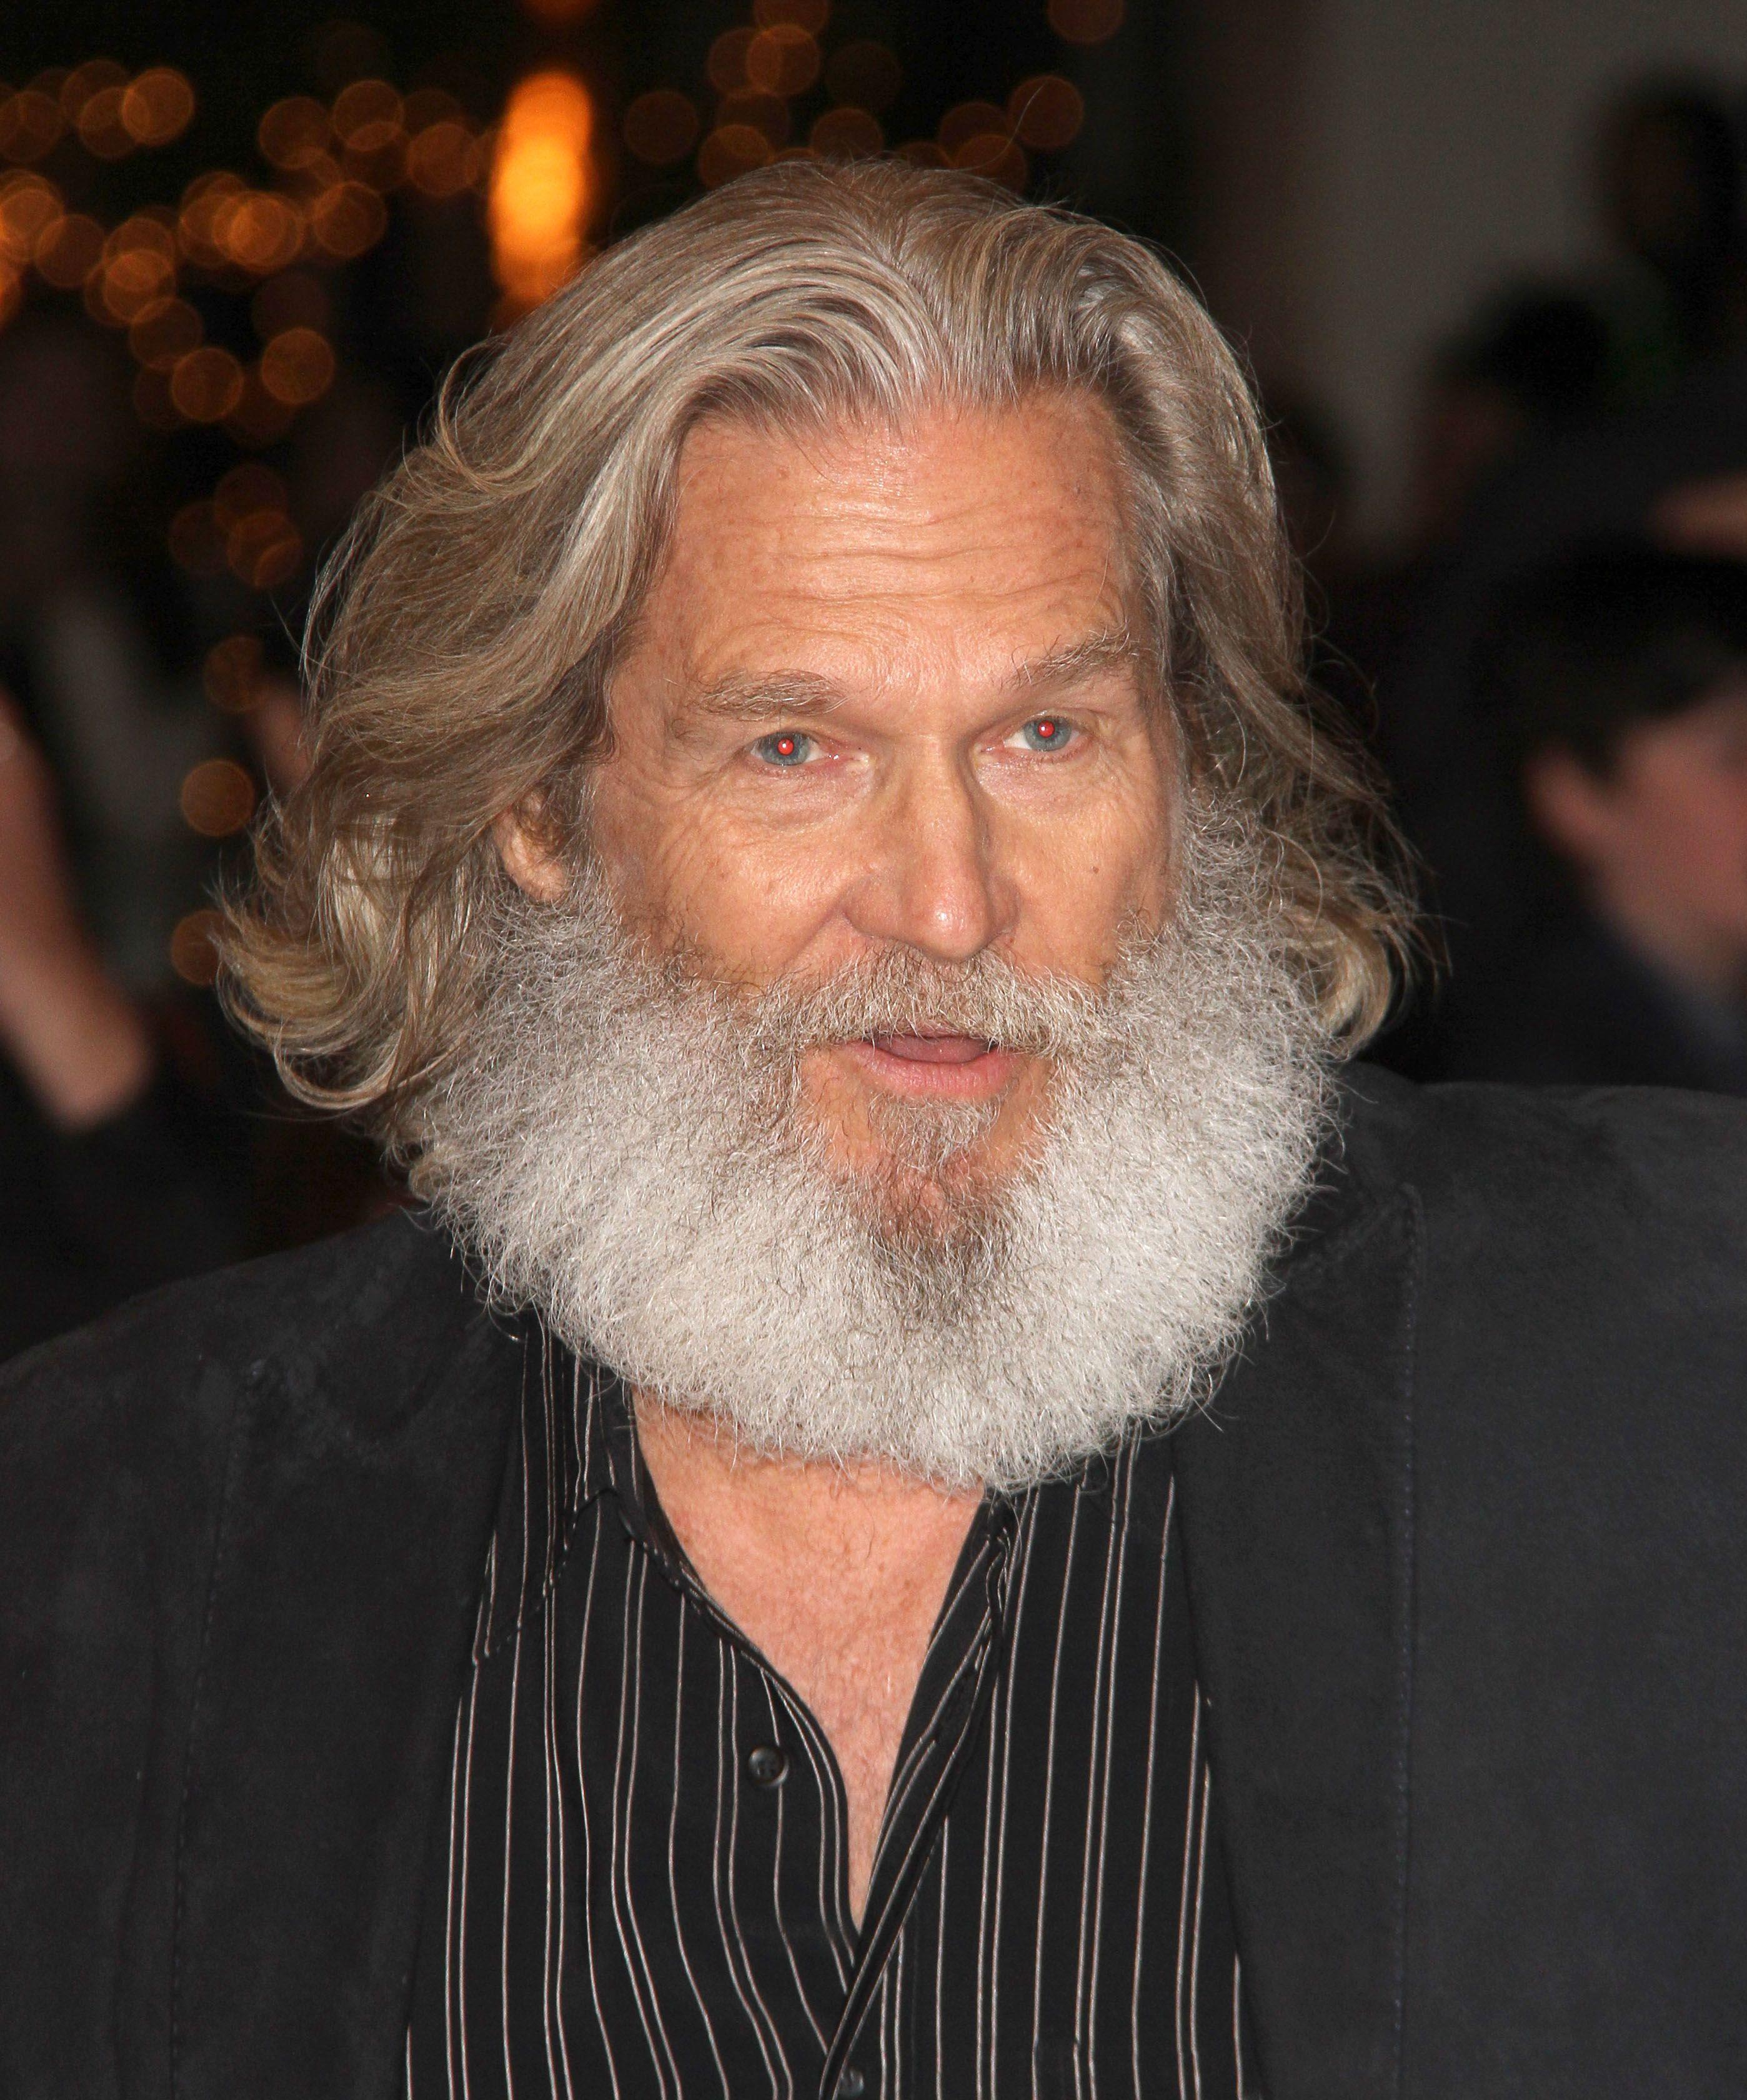 Jeff Bridges Fantastic Hair Amp Beard Oh Boy Jeff